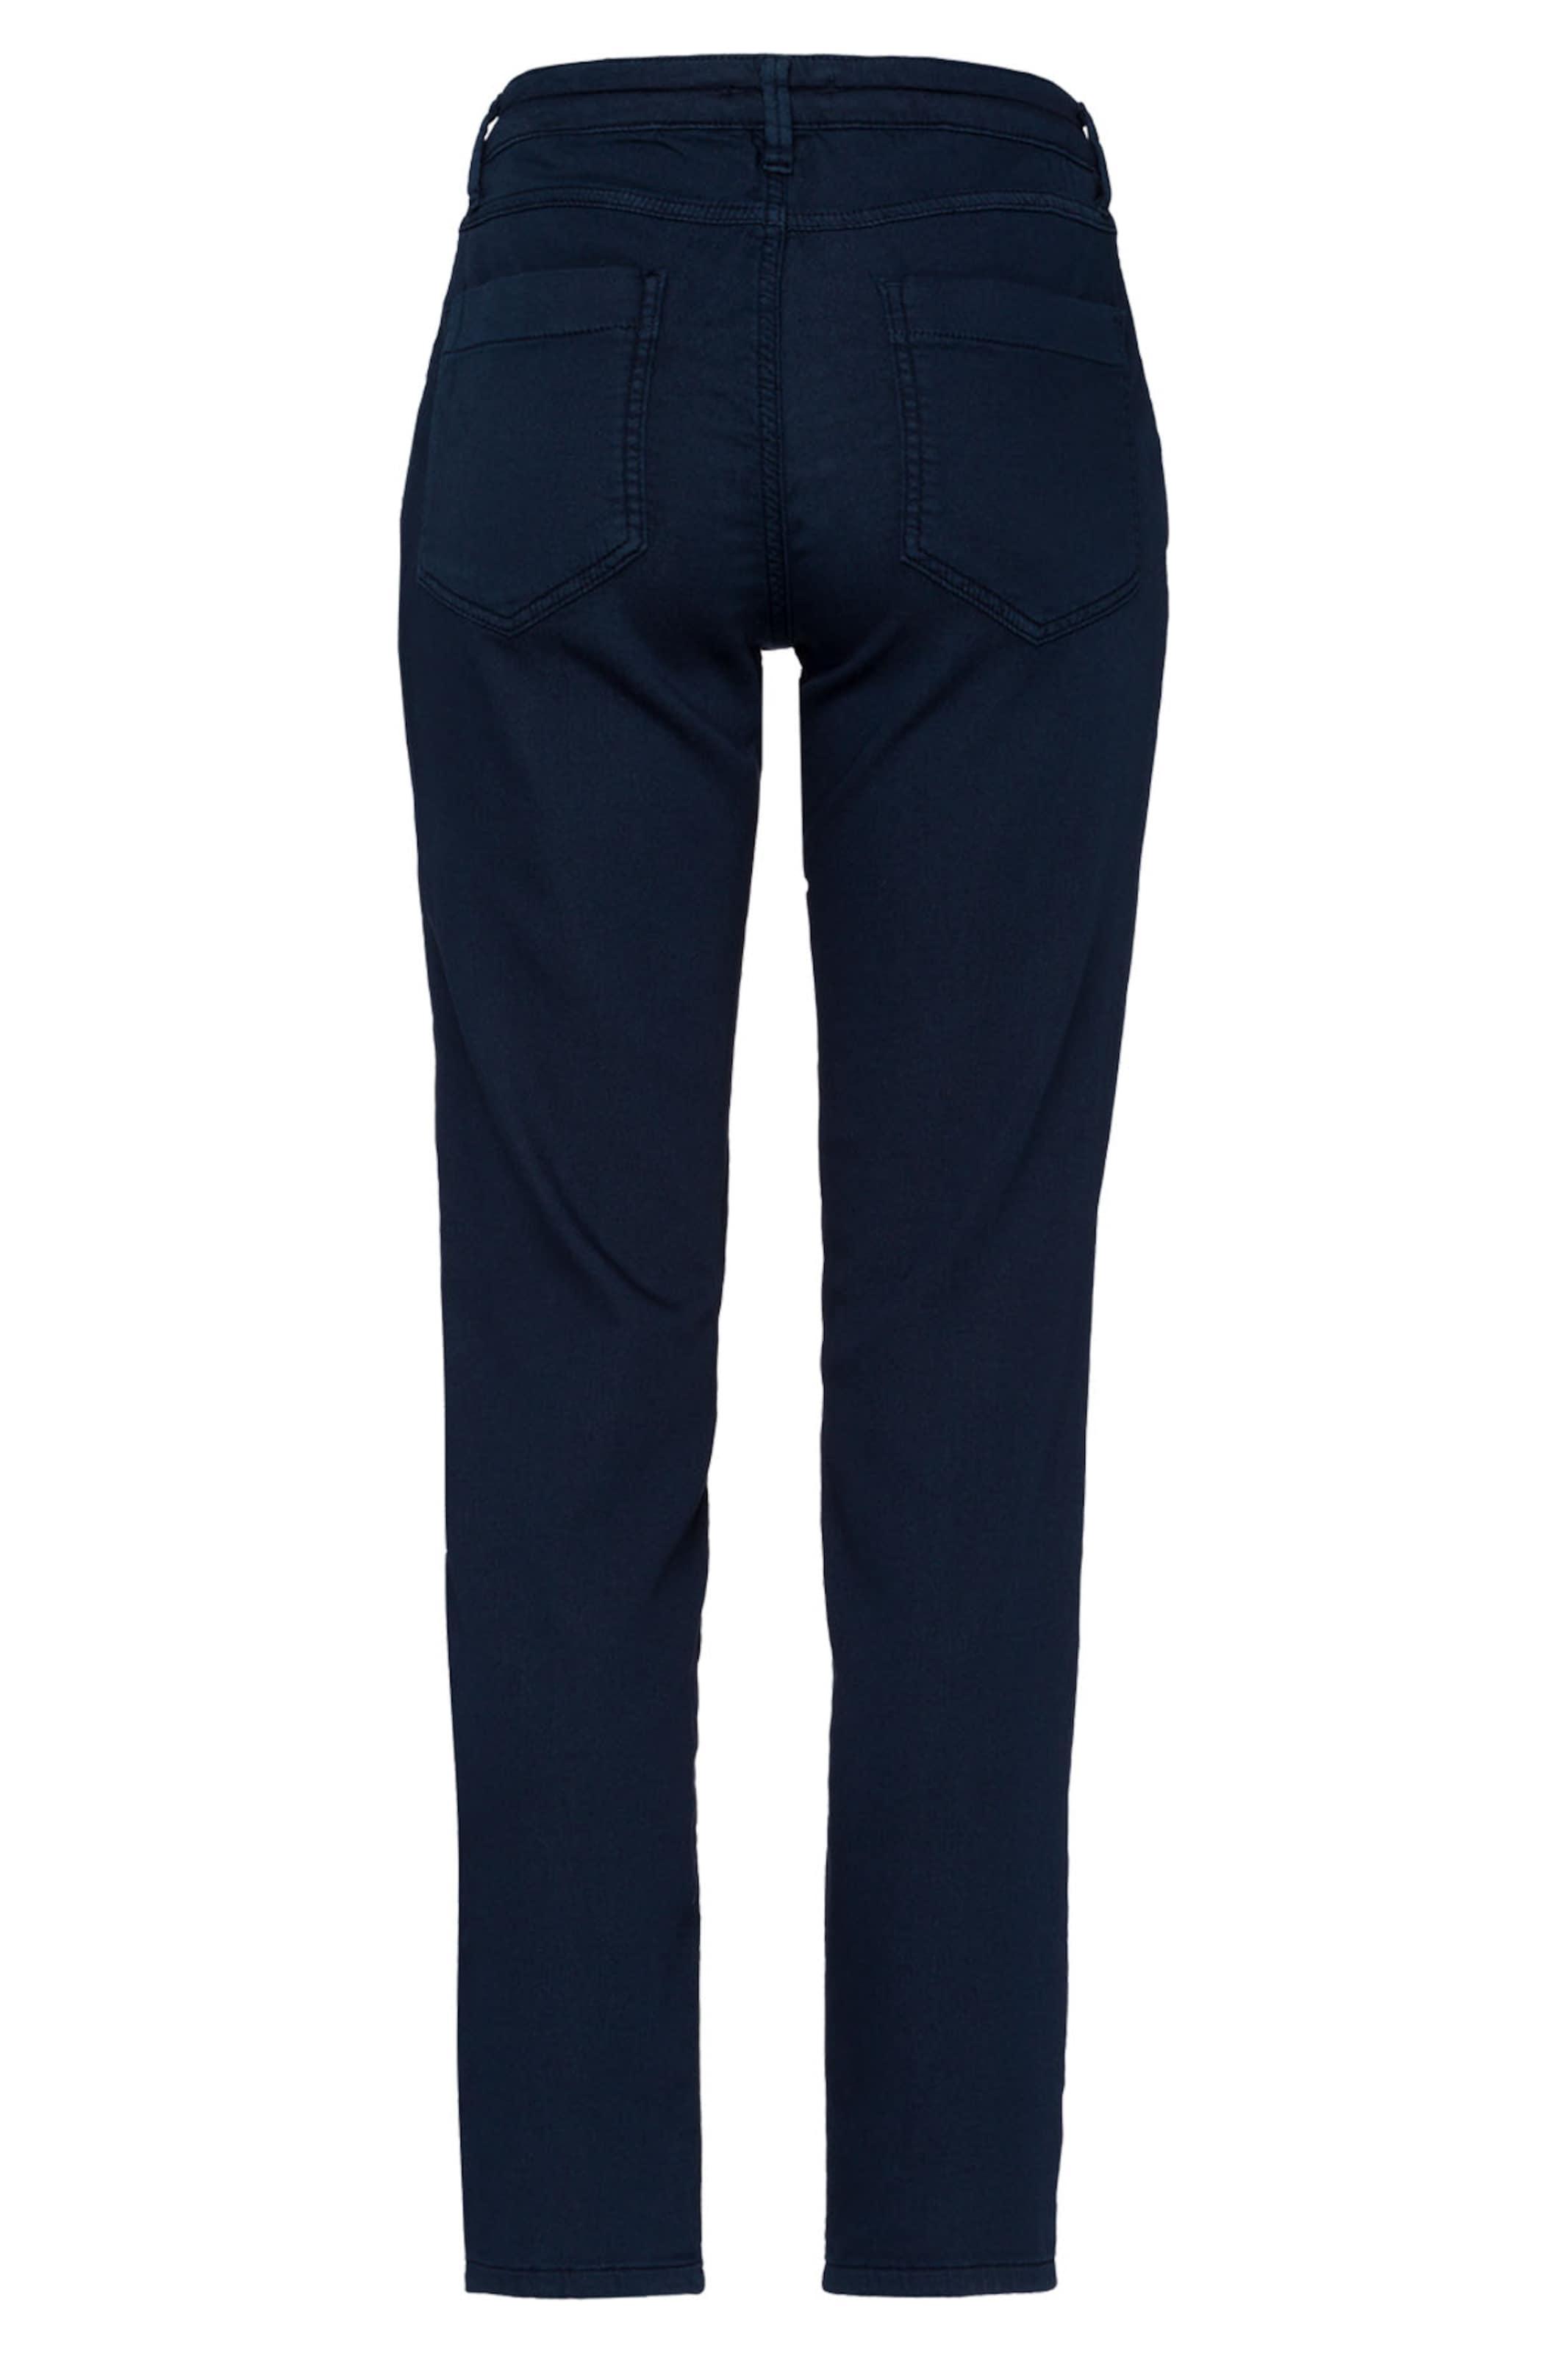 MORE & MORE Sweatpants, Jogg-Style